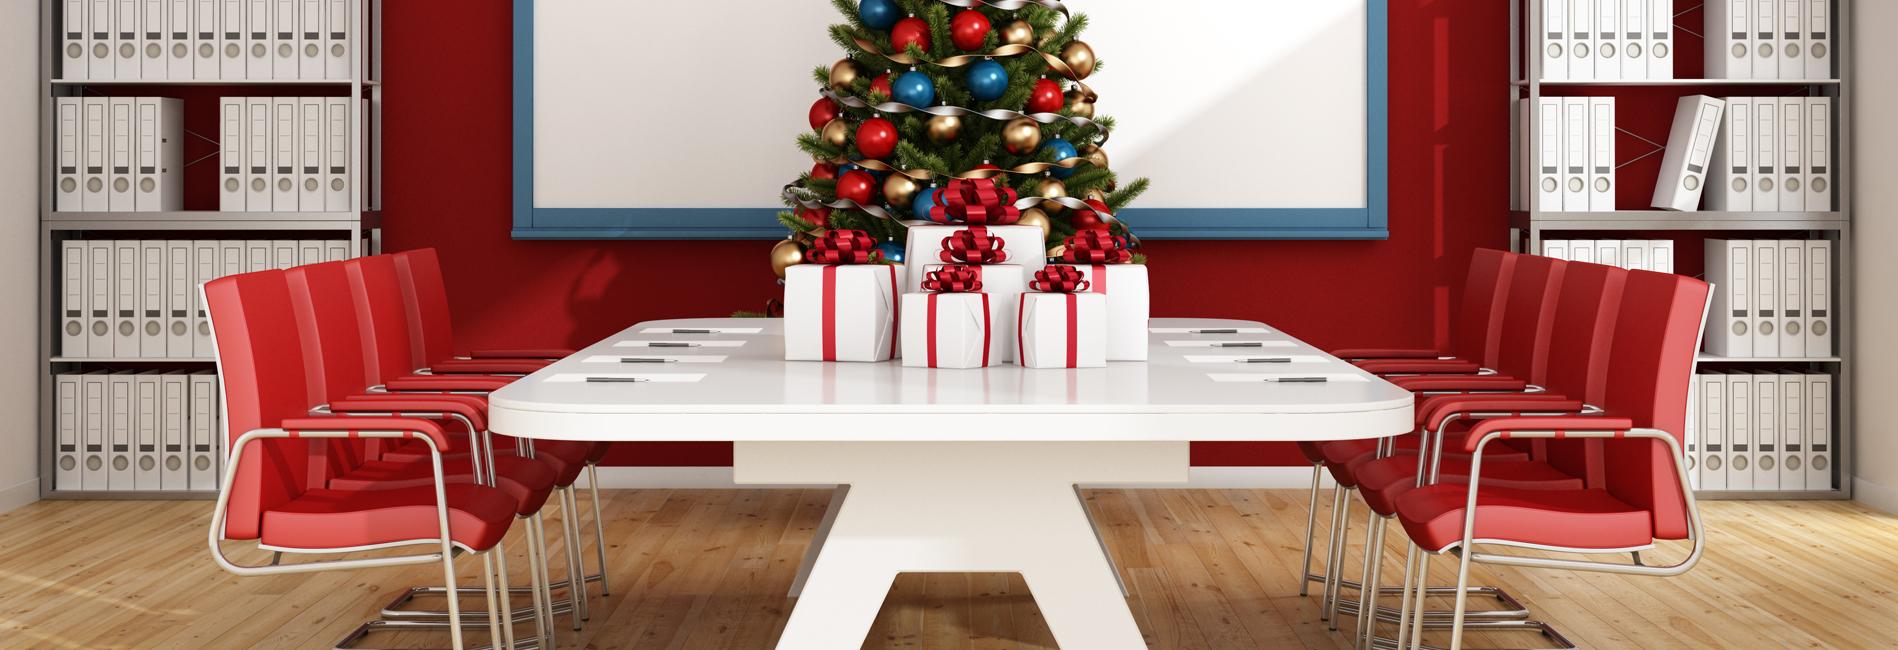 holiday meeting room